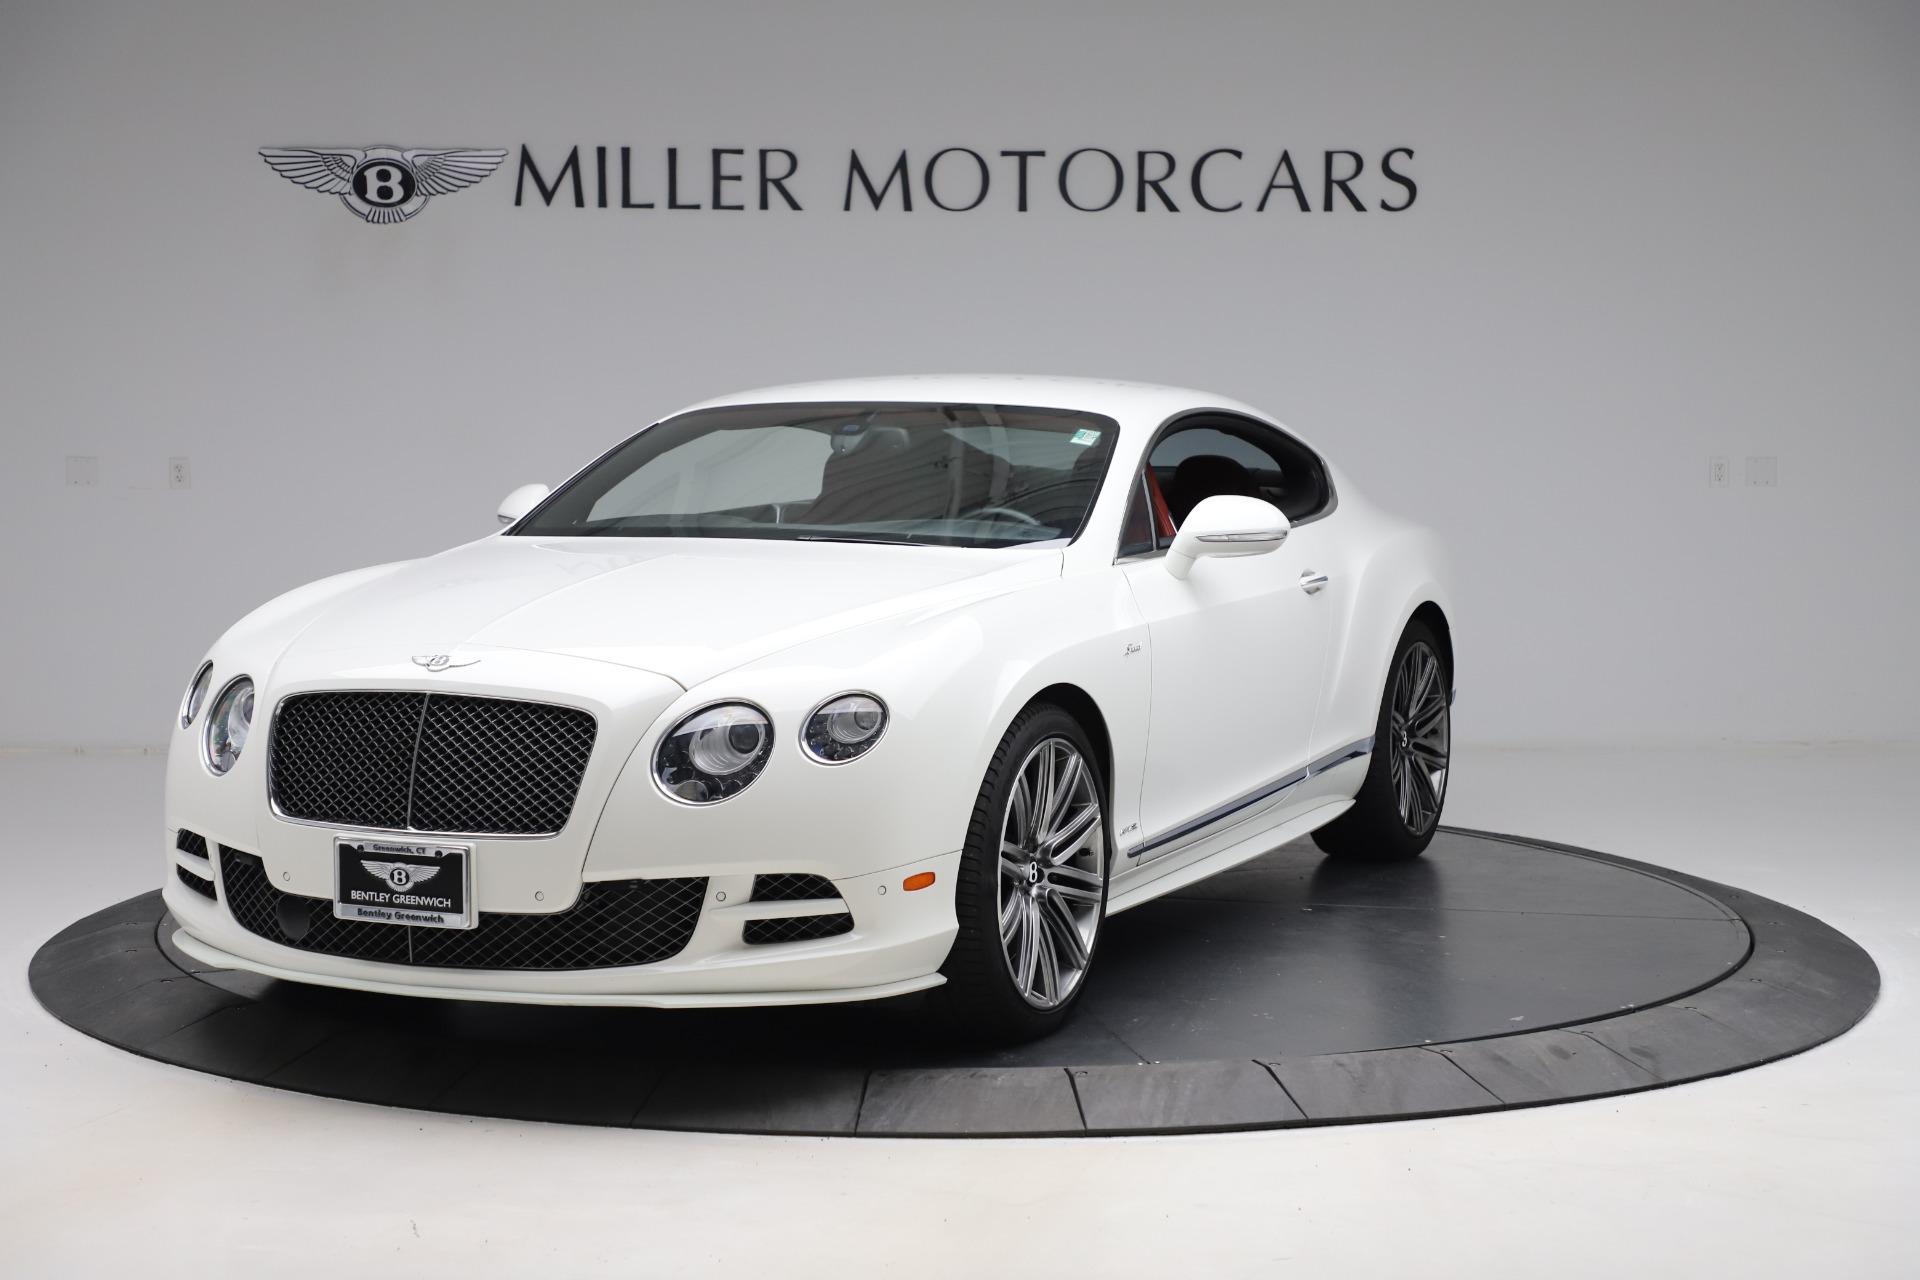 Used 2015 Bentley Continental GT Speed for sale $109,900 at Maserati of Westport in Westport CT 06880 1